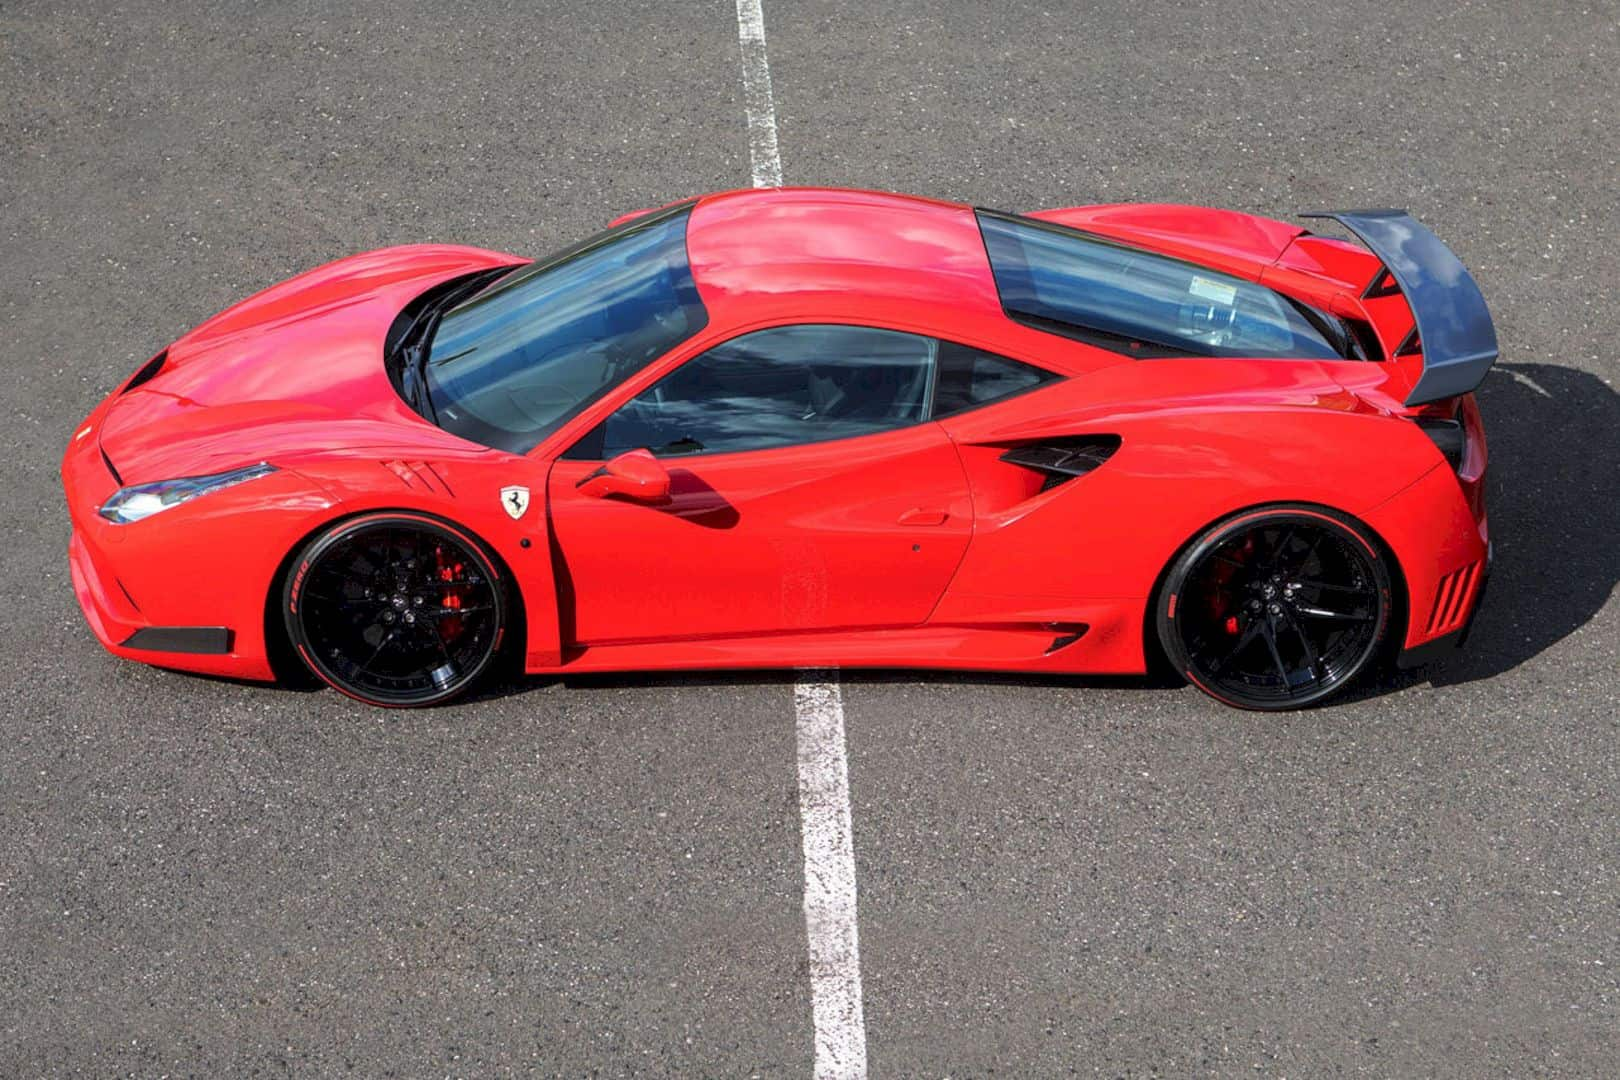 Redefine Glamour with Revamp Edition of Ferrari 488 GTB N-Largo by Novitec